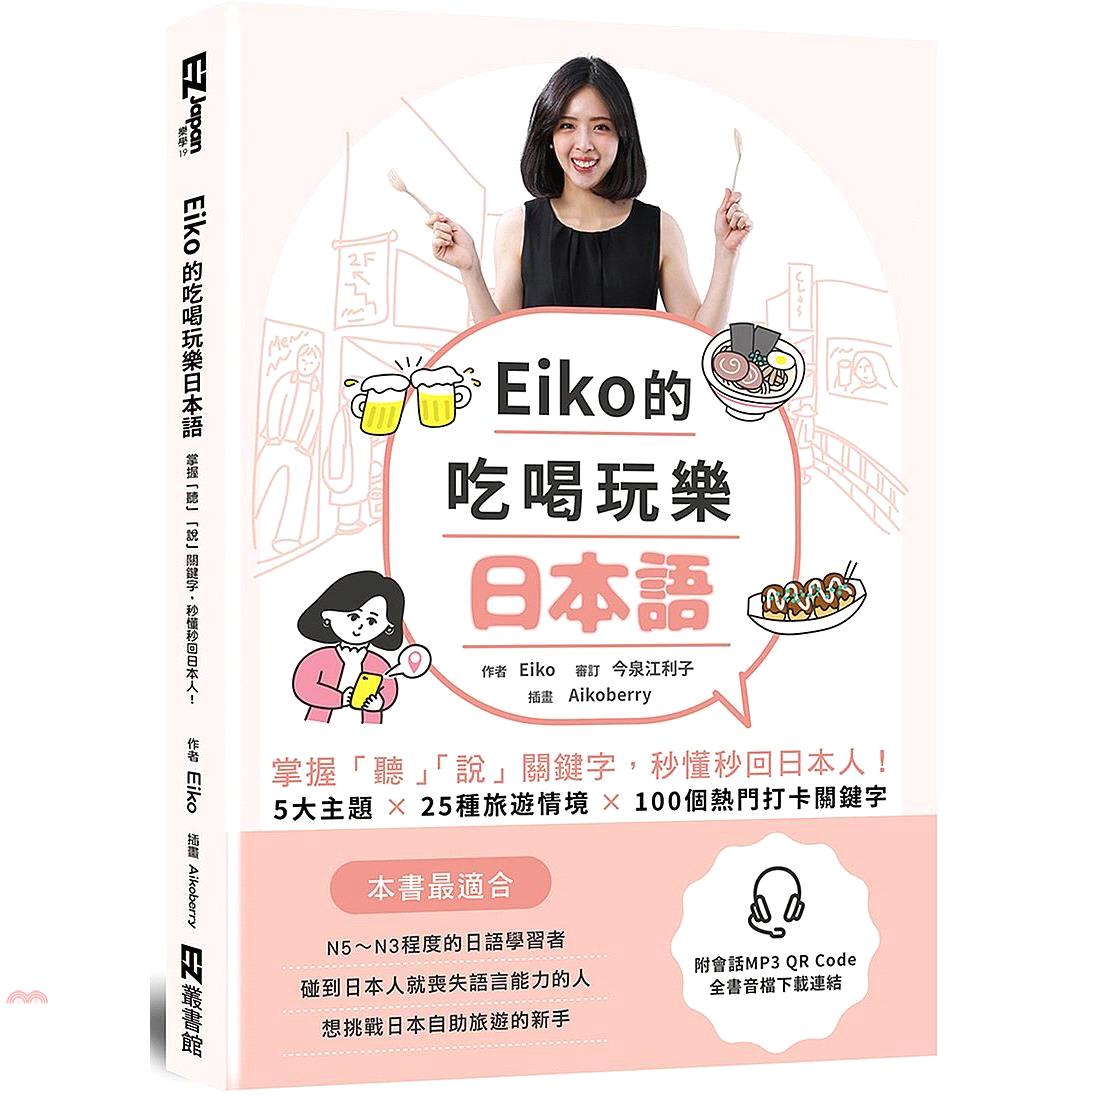 Eiko的吃喝玩樂日本語:掌握「聽」「說」關鍵字,秒懂秒回日本人!(附QR code音檔)[79折]